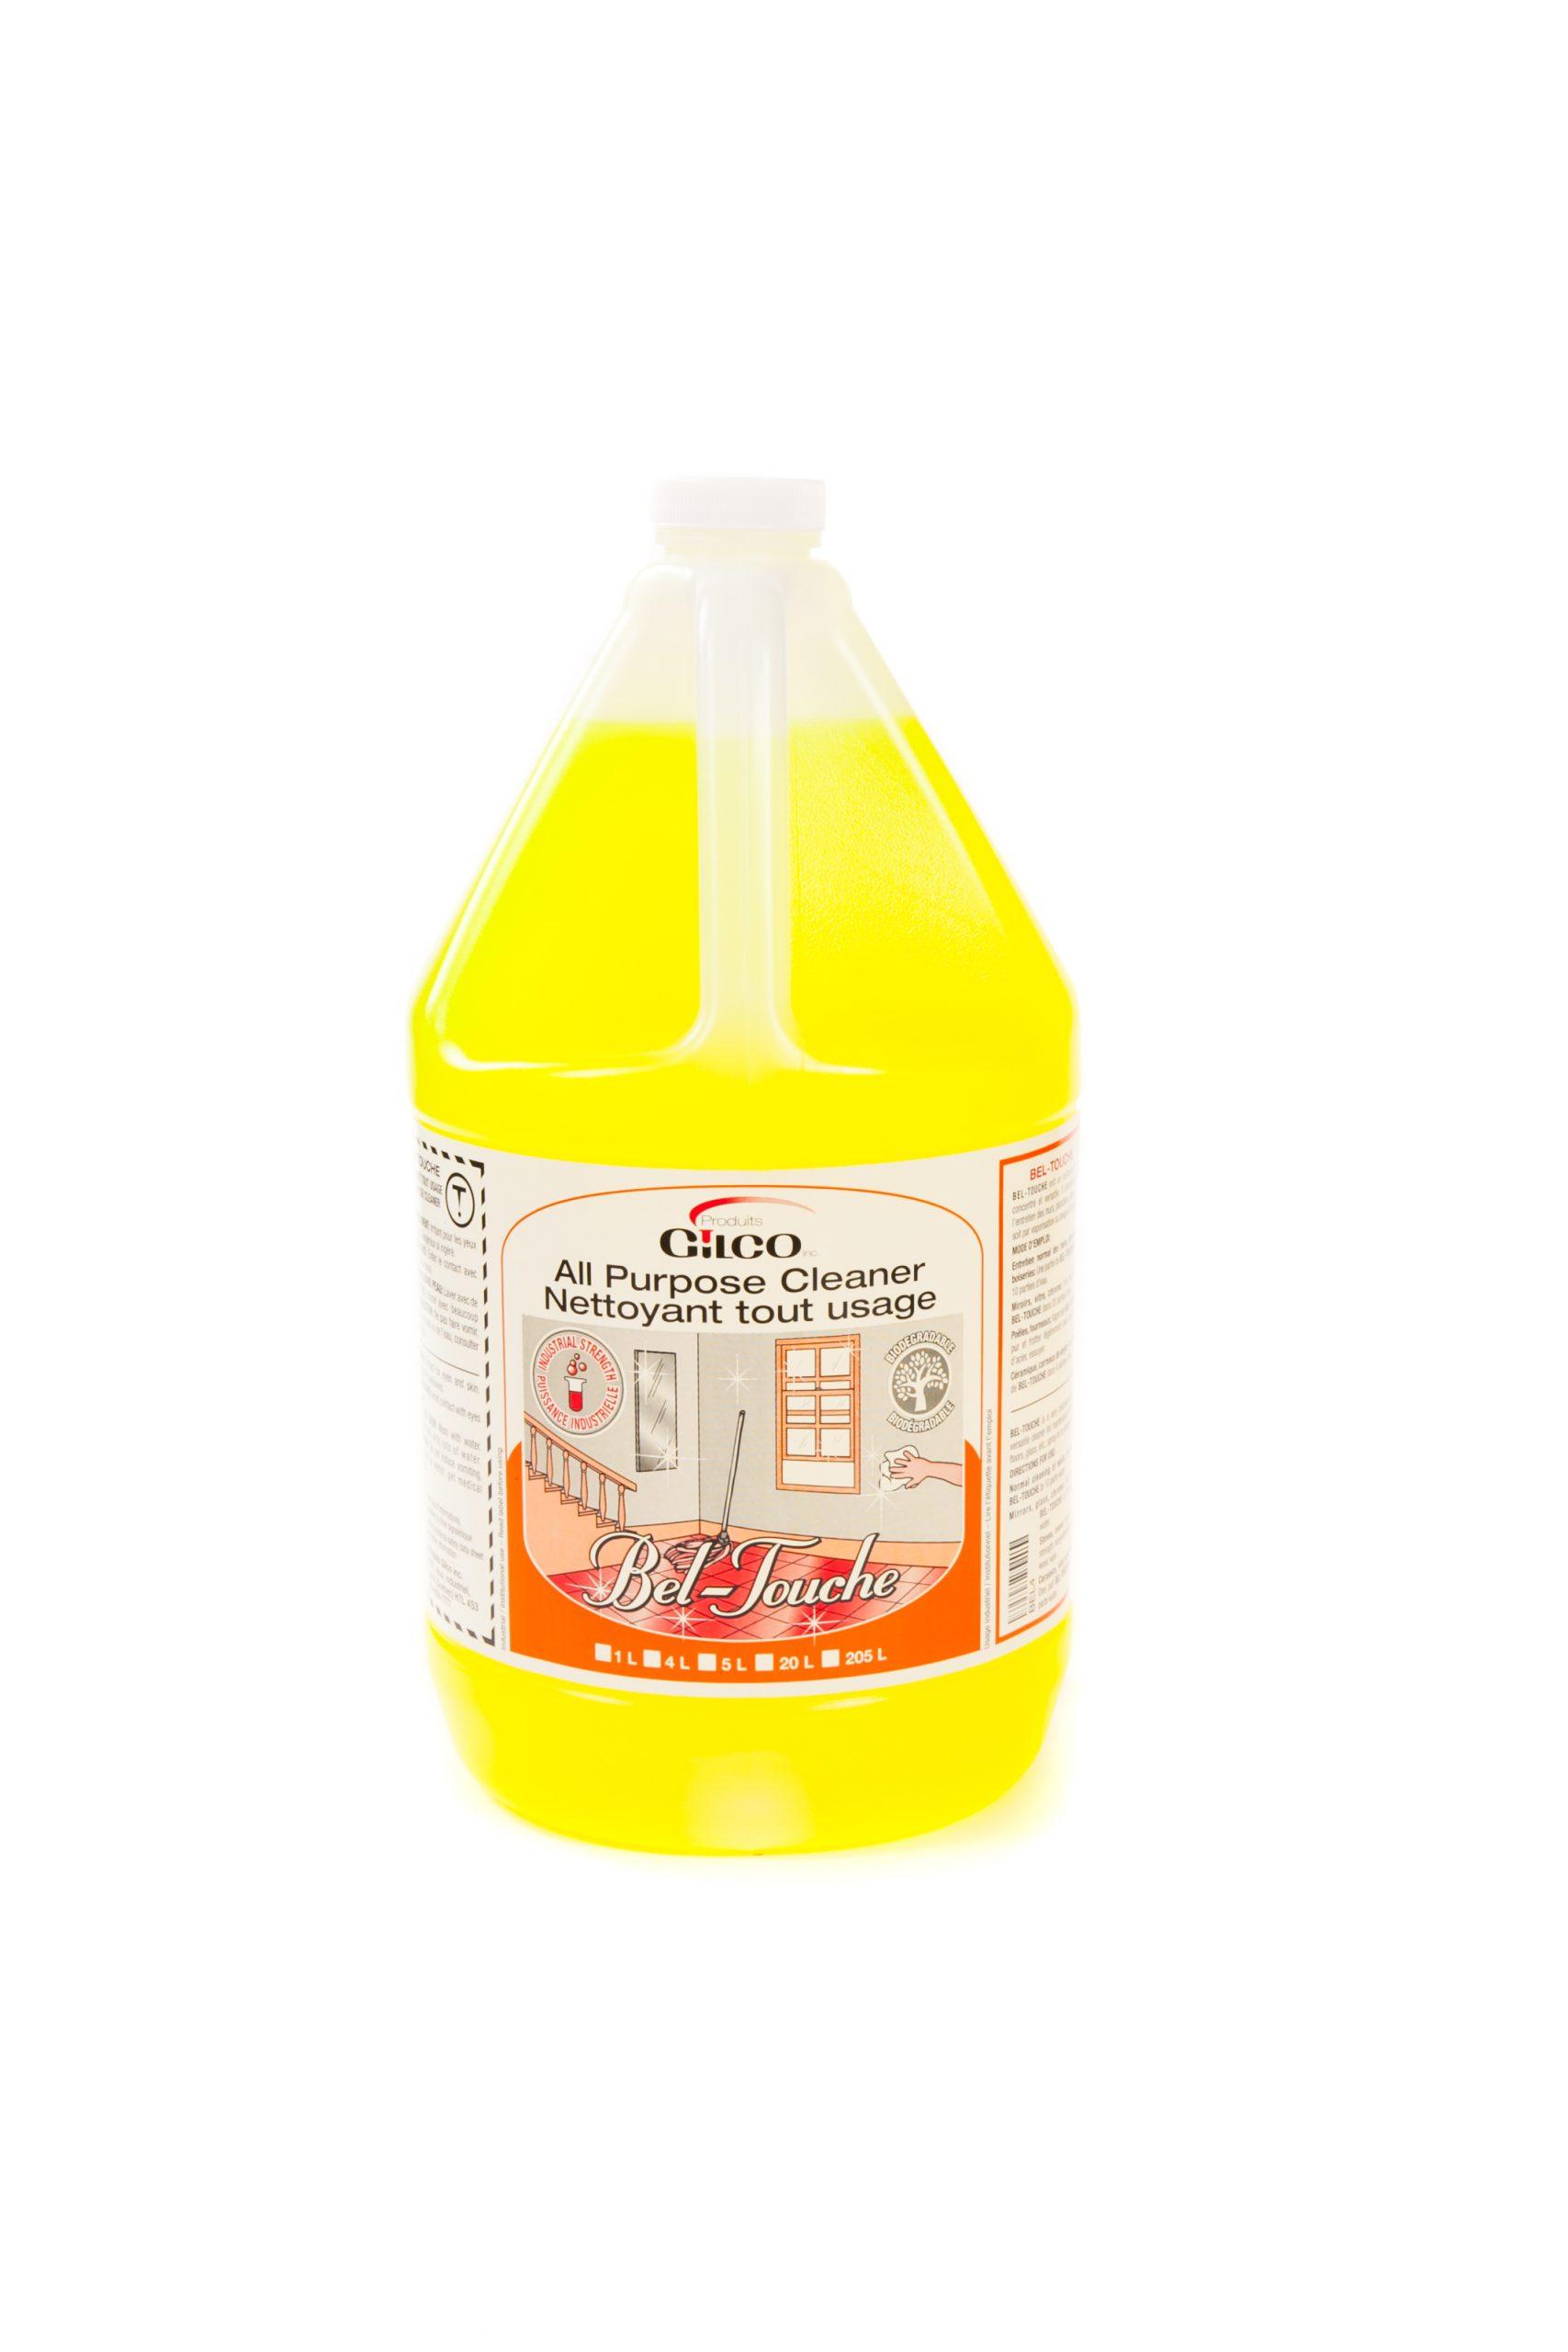 BEL-TOUCHE BIODEG.ALL-PURPOSE CLEANER – 4 X 4 LT /CS